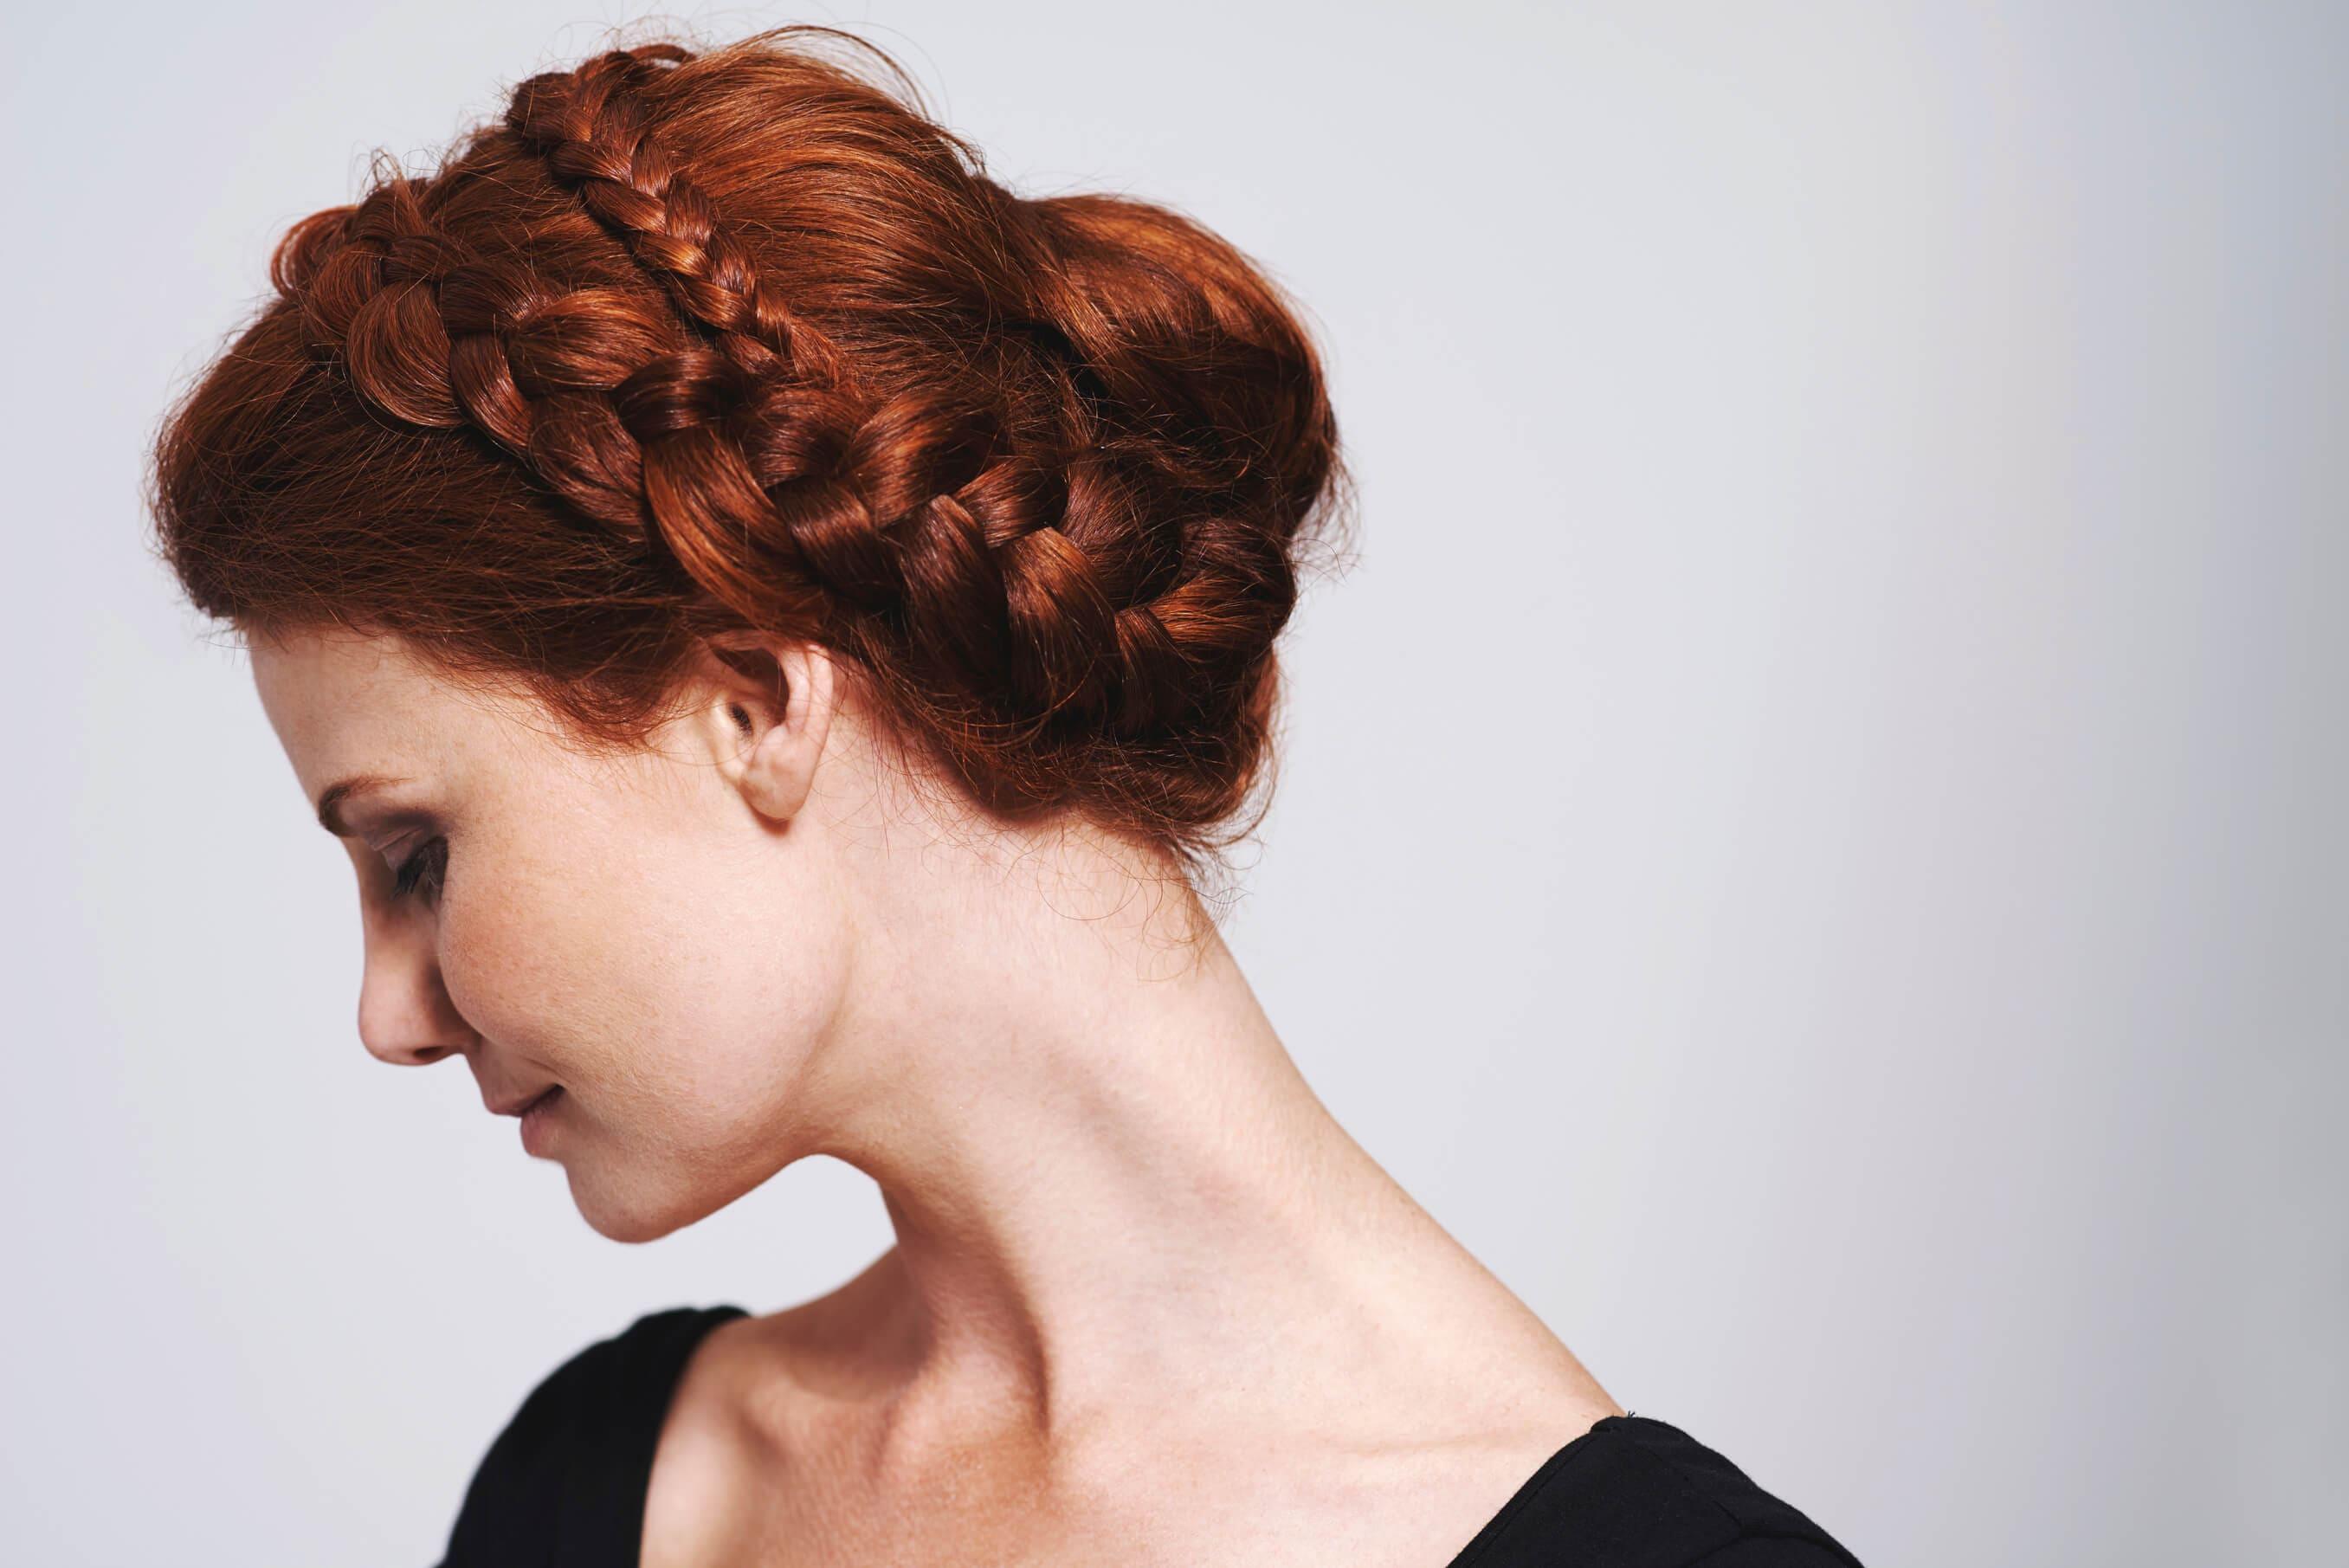 Create chic winter ball hairstyles with a braided bun